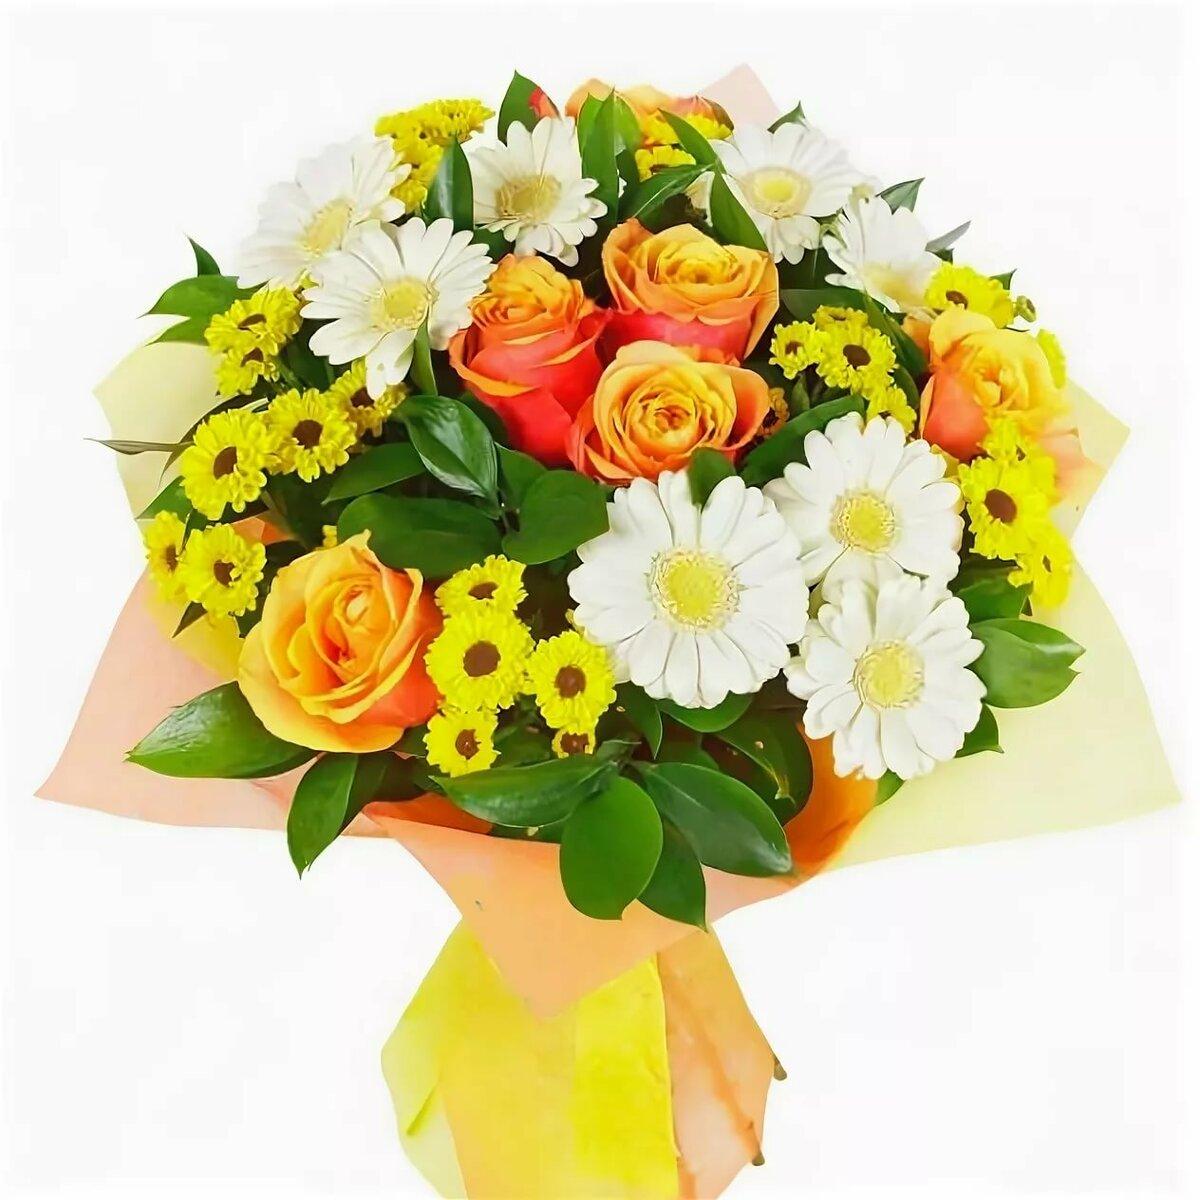 Свадьбу, заказ цветов украина